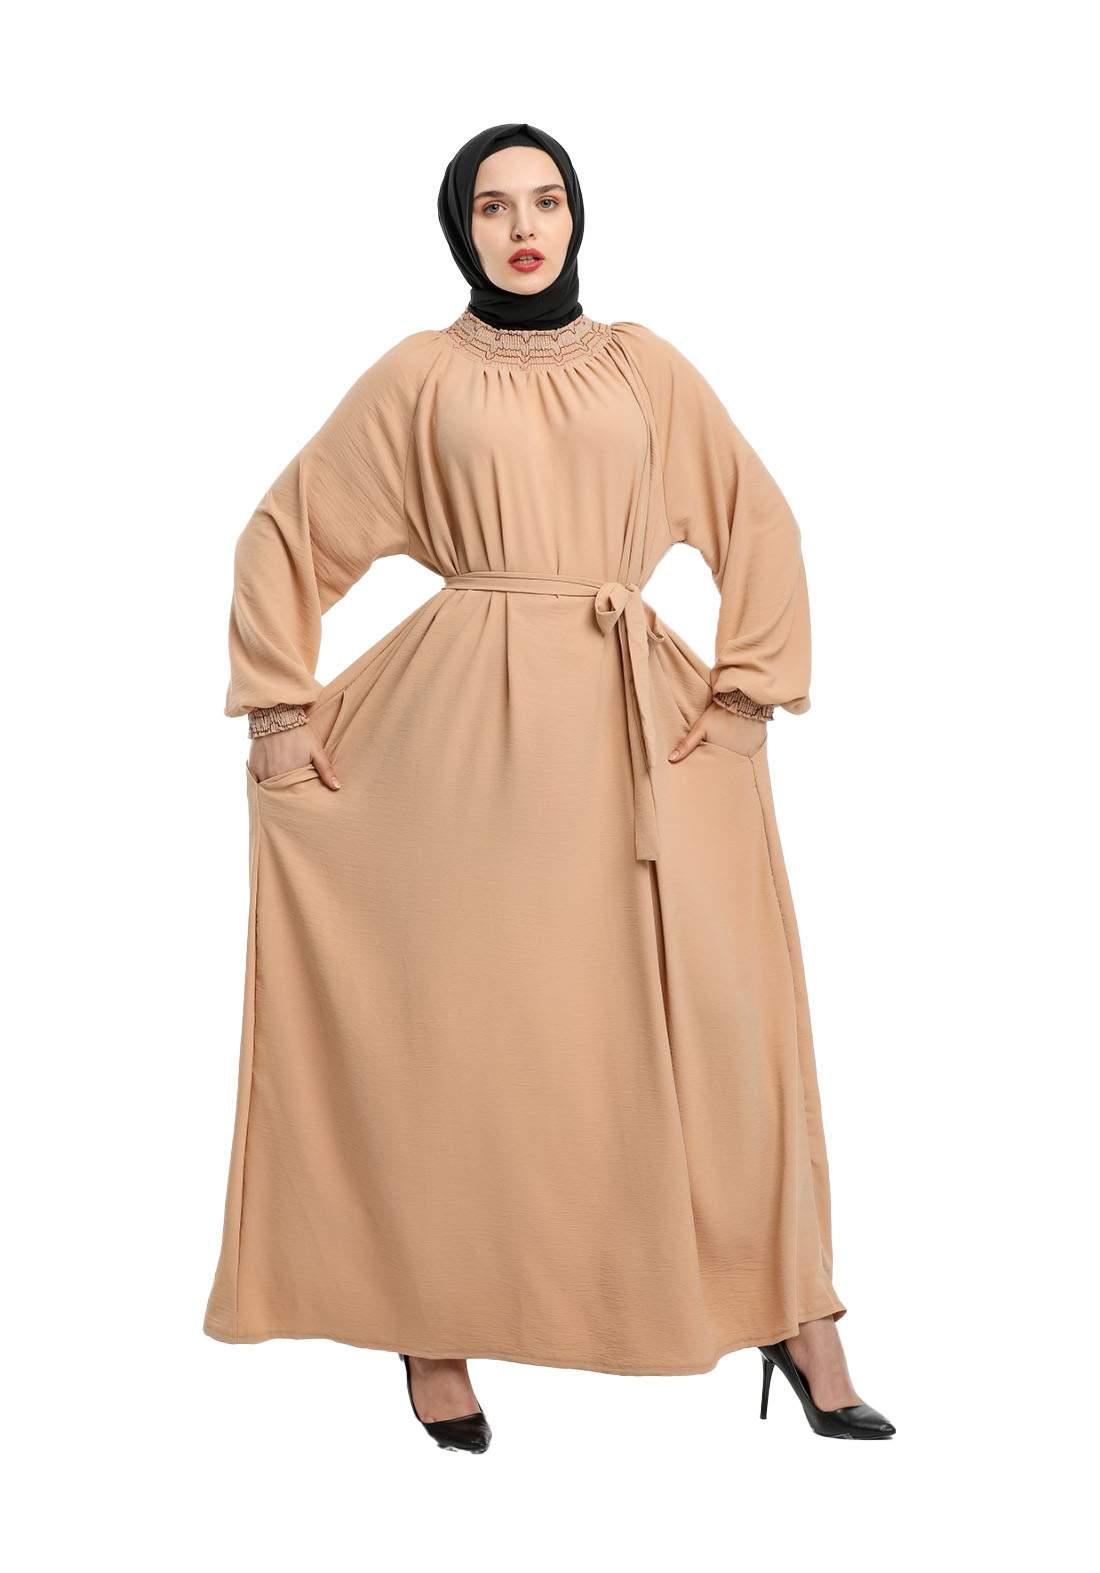 فستان نسائي بيج اللون